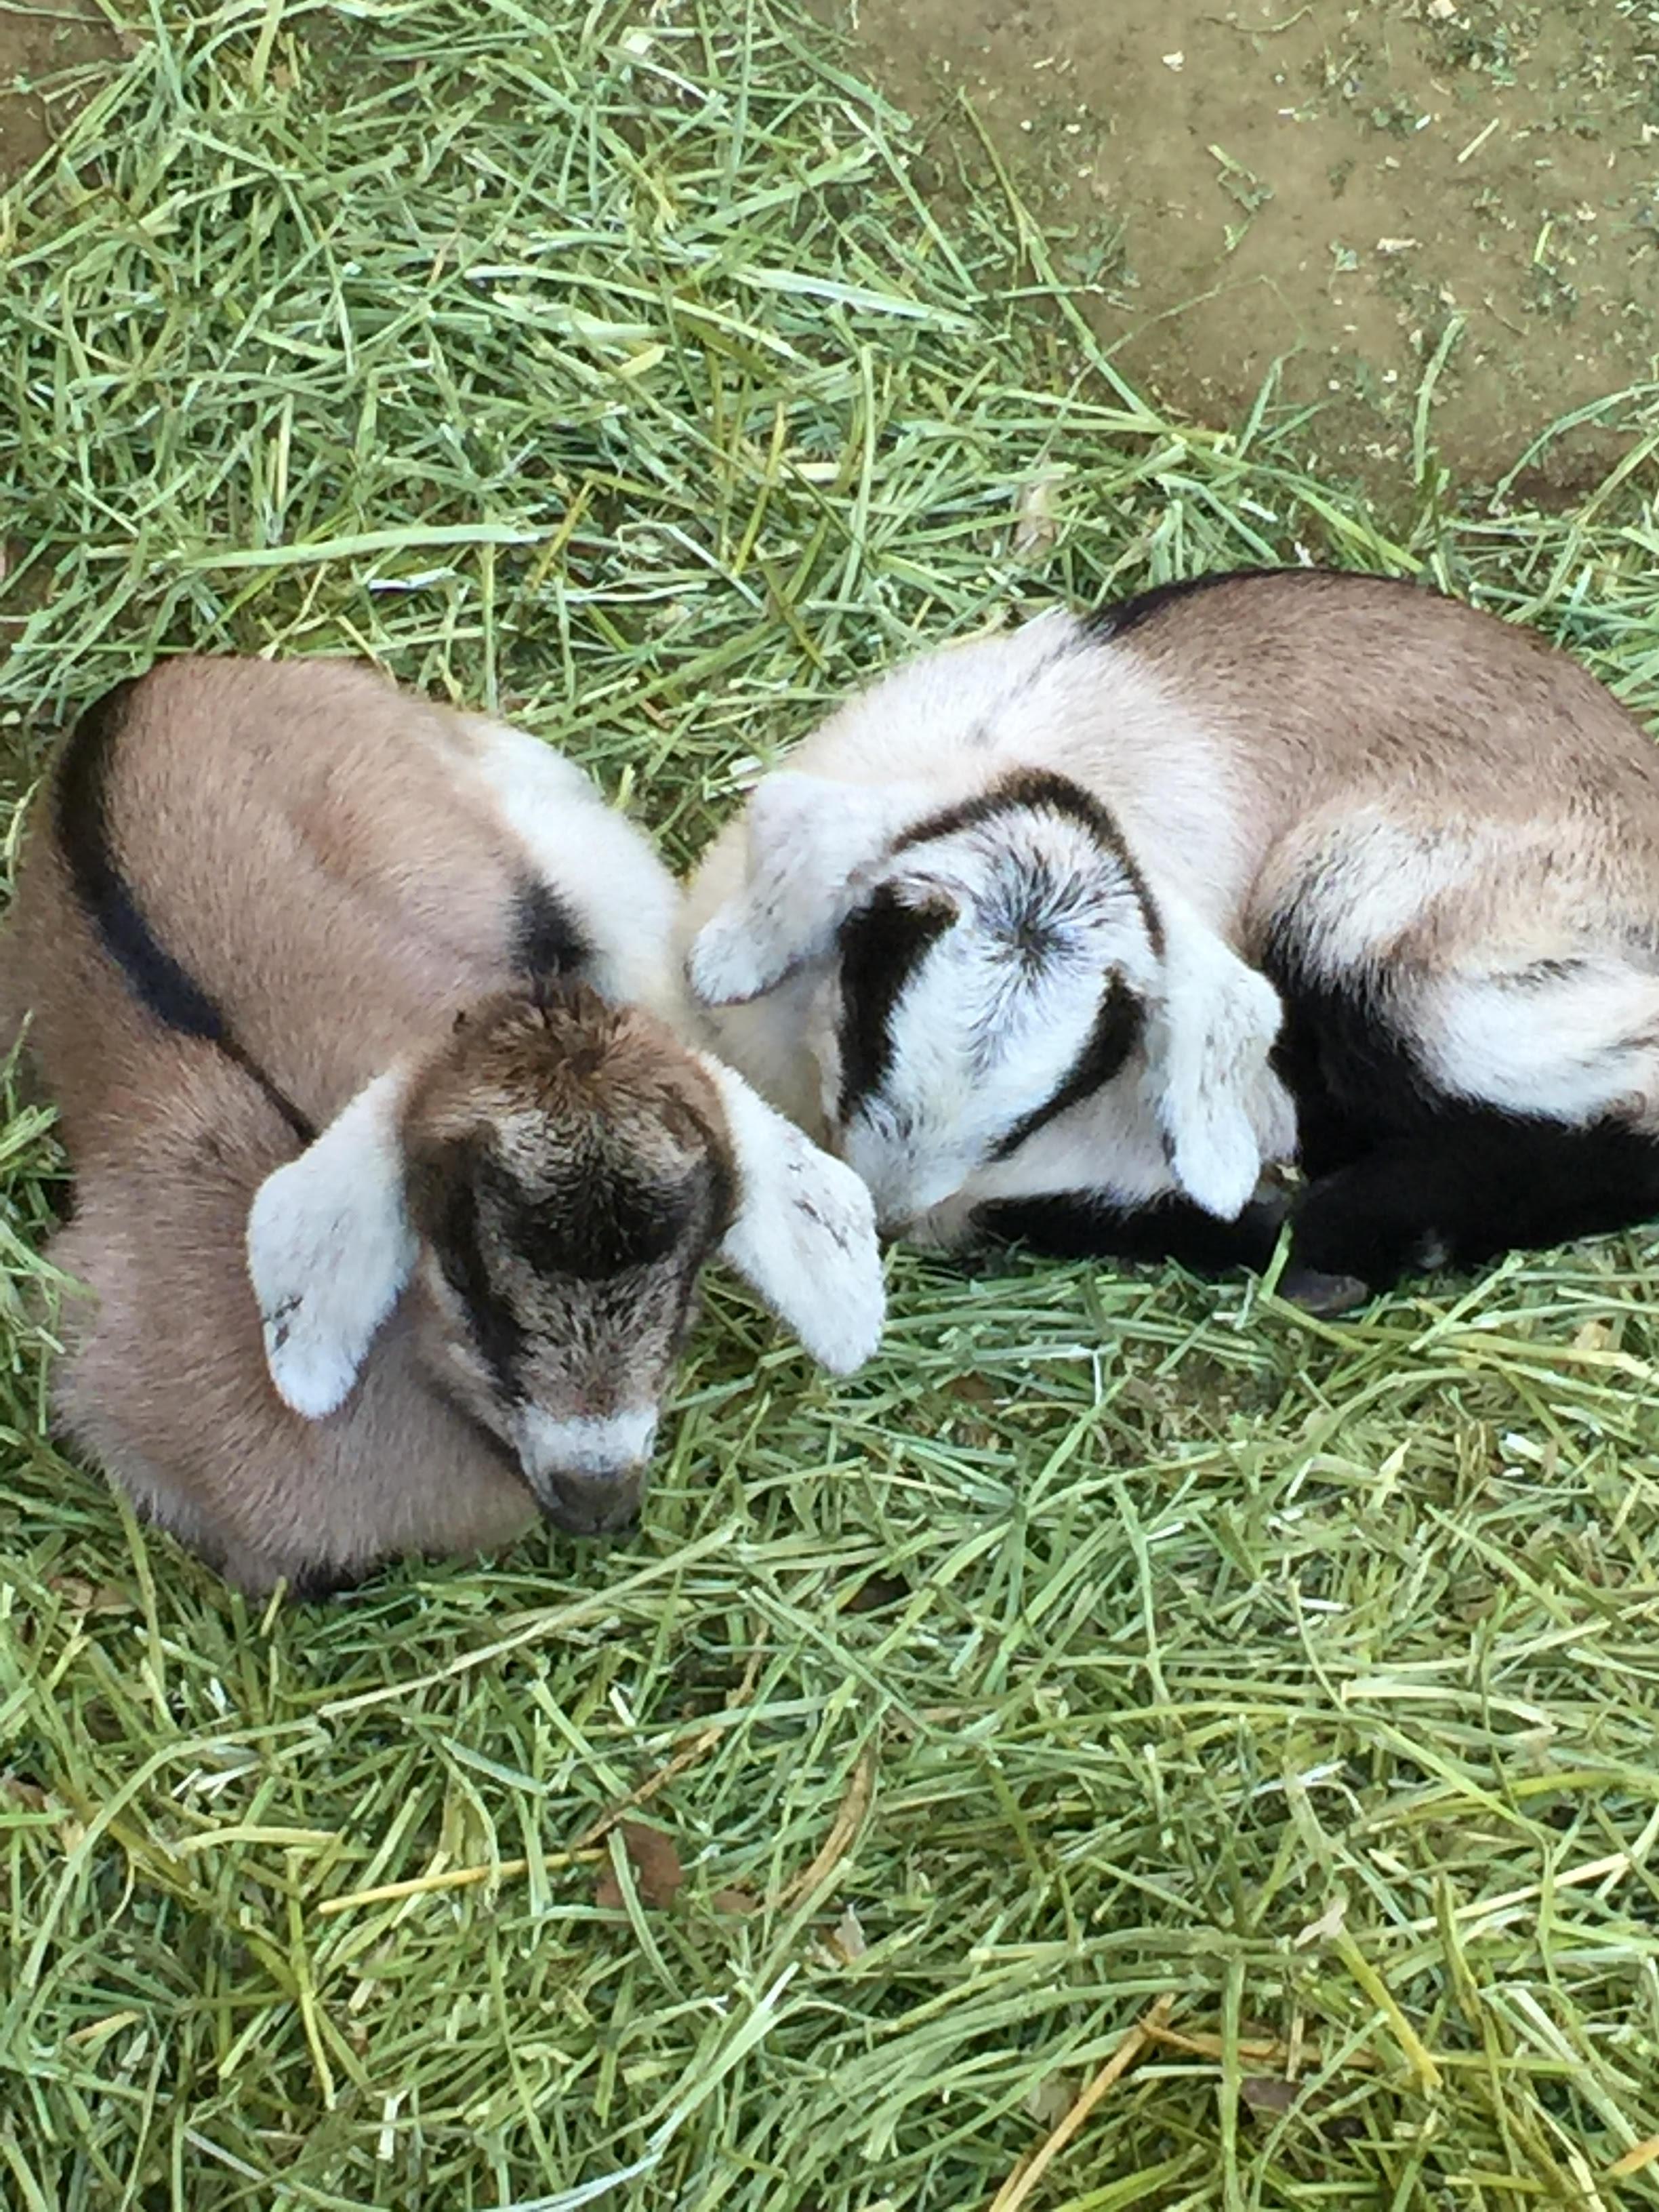 Two new born goats - Julias kids Feb 2016